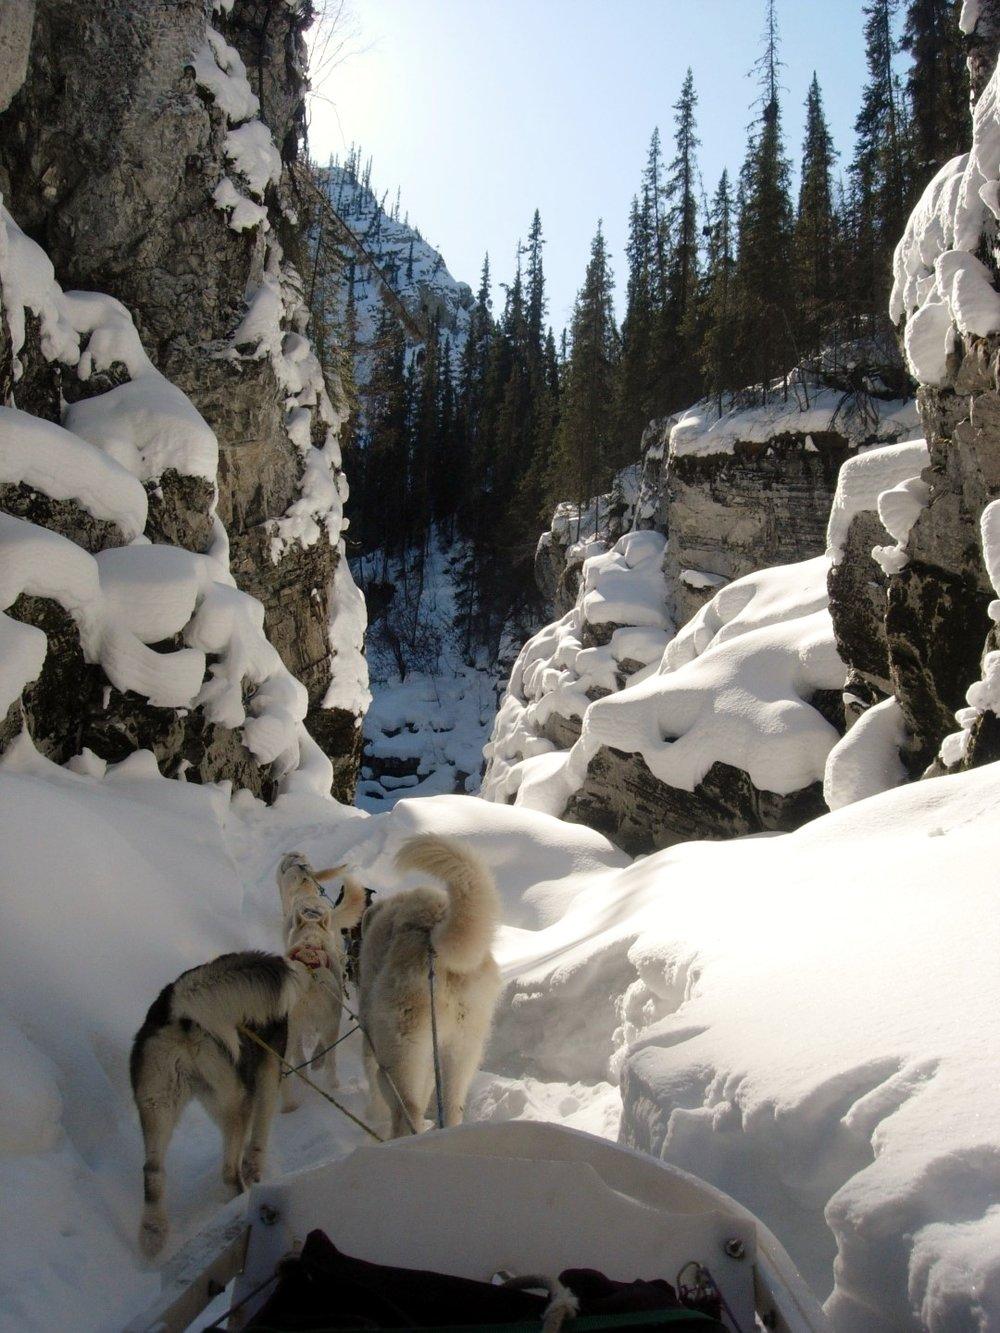 Dog Sledge National Park Service Yukon Charley Rivers Preserve